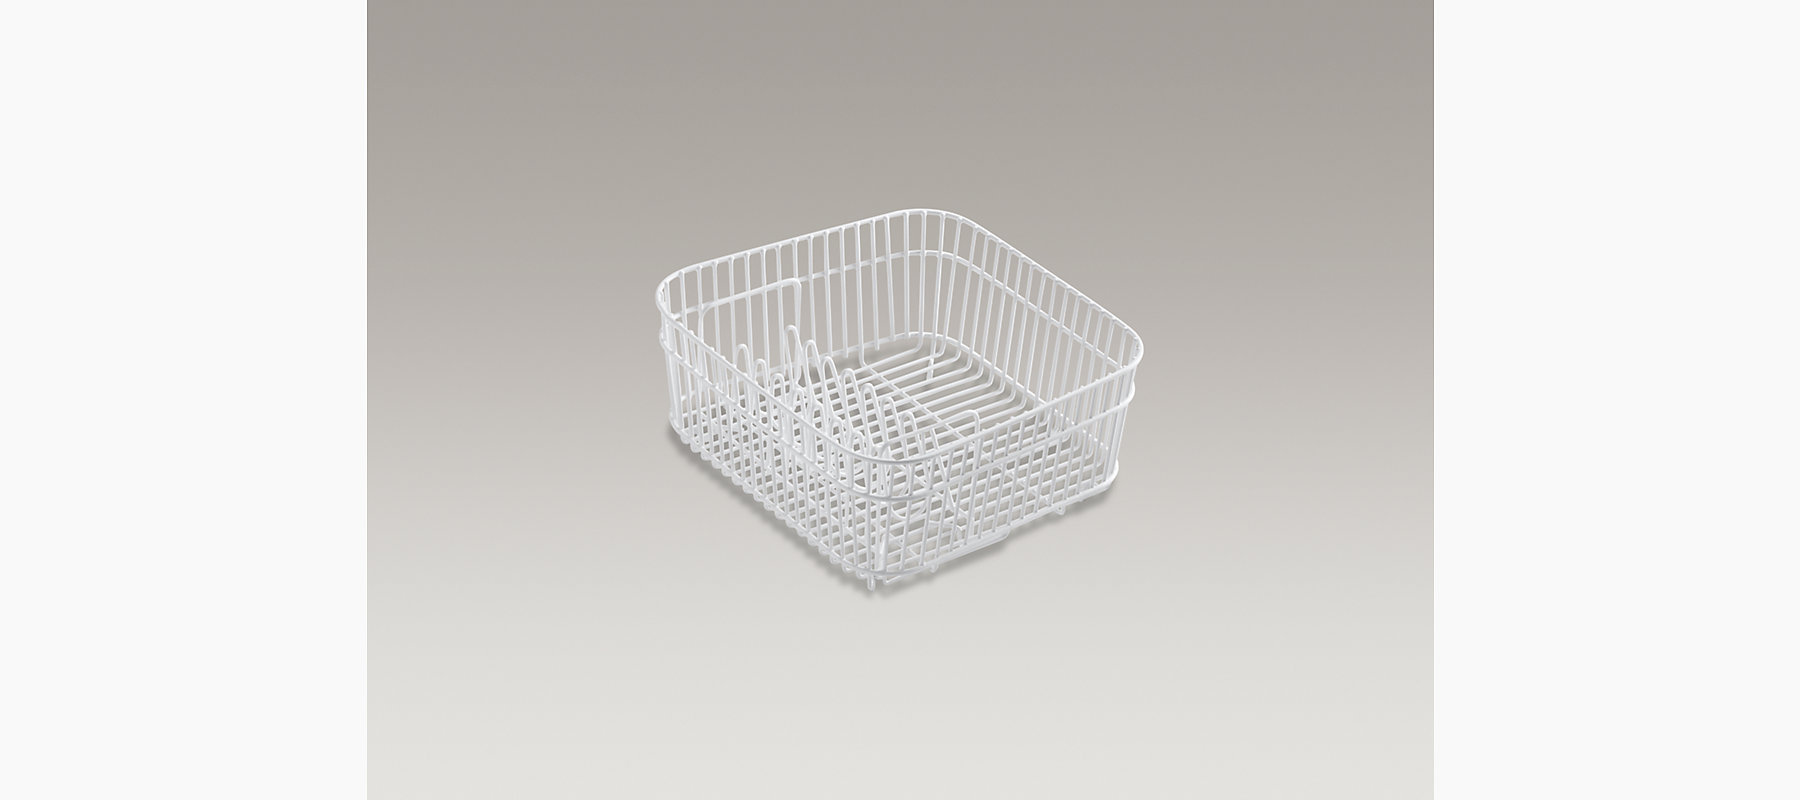 KOHLER: Wire Basket | KOHLER